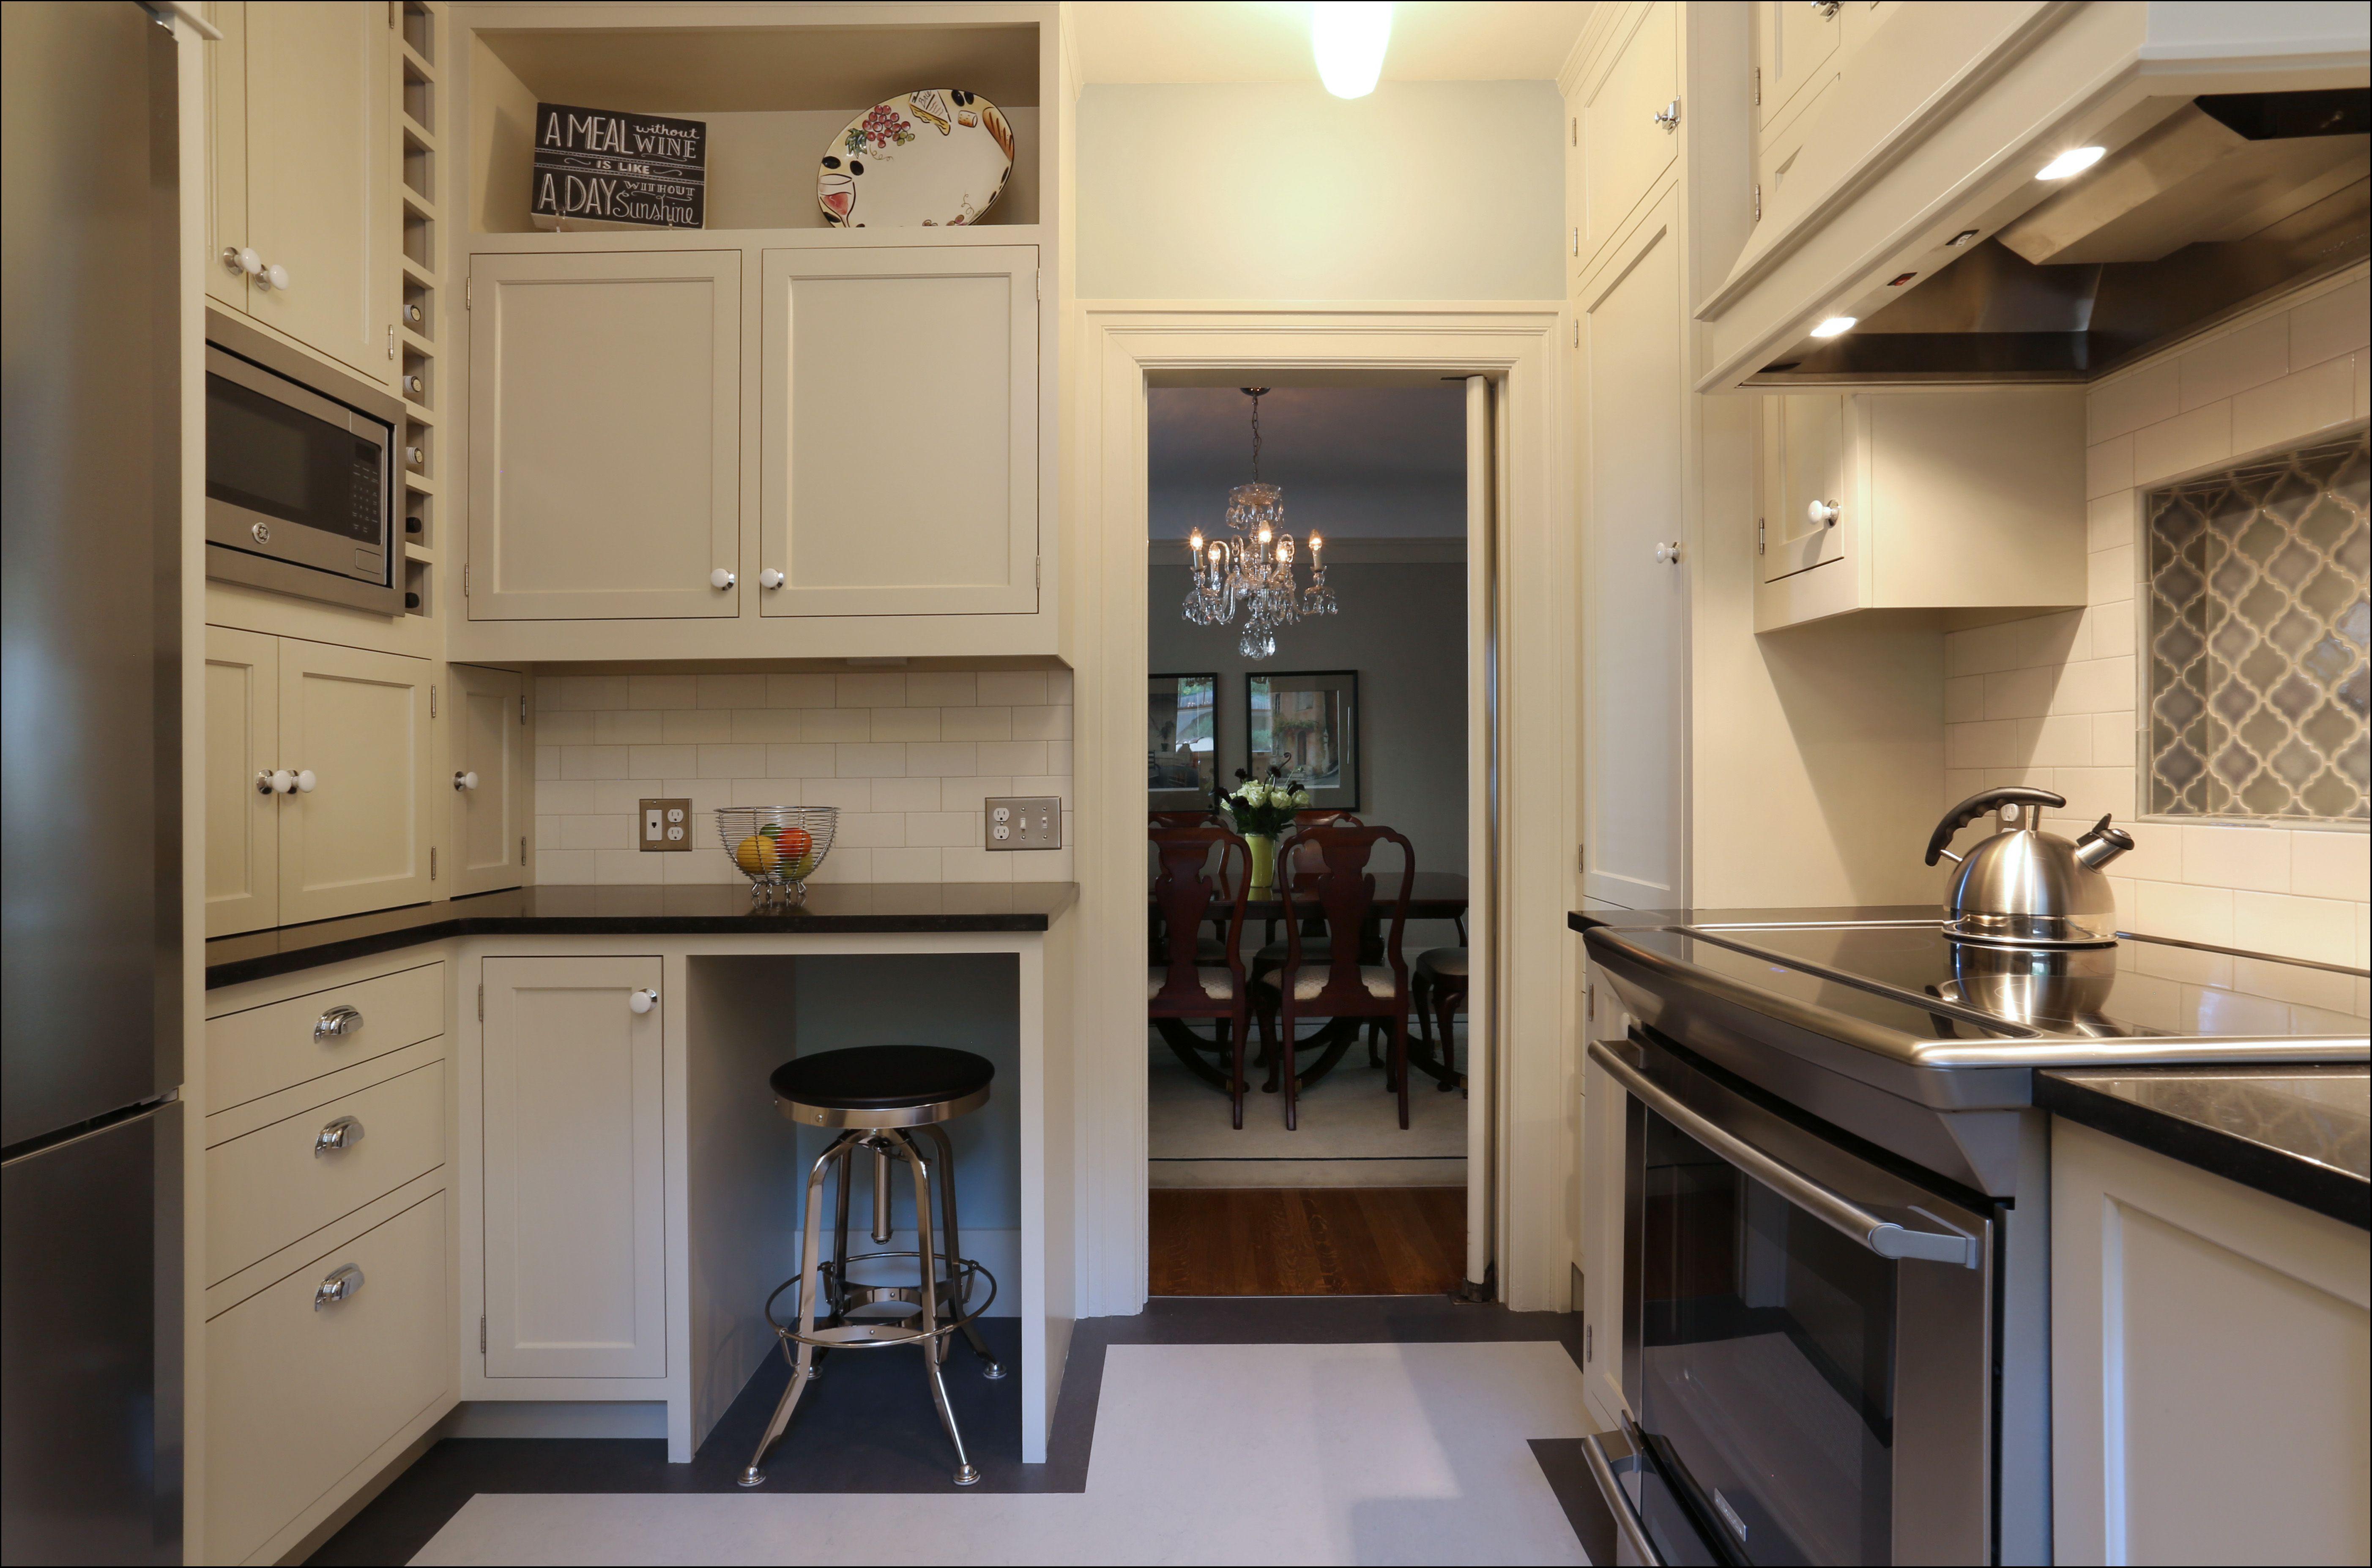 1916 kitchen layout - Google Search